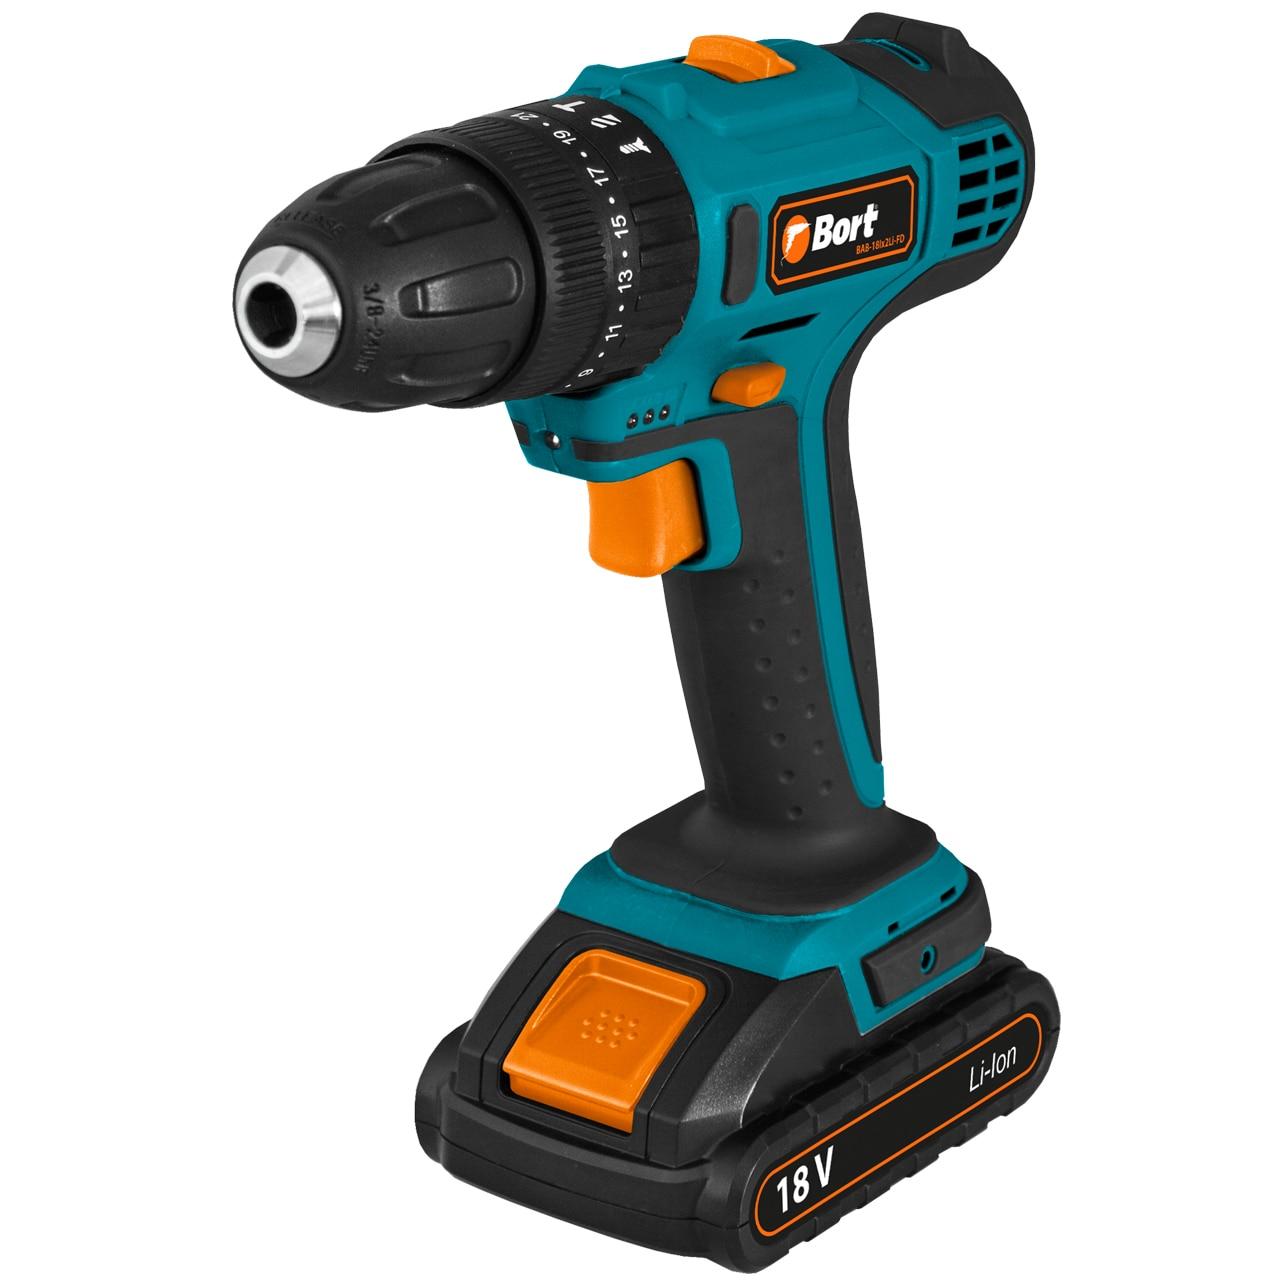 Drill driver rechargeable shock BORT BAB-18Ix2Li-FD shock absorber ad2580 absorber buffer bumper free shipping